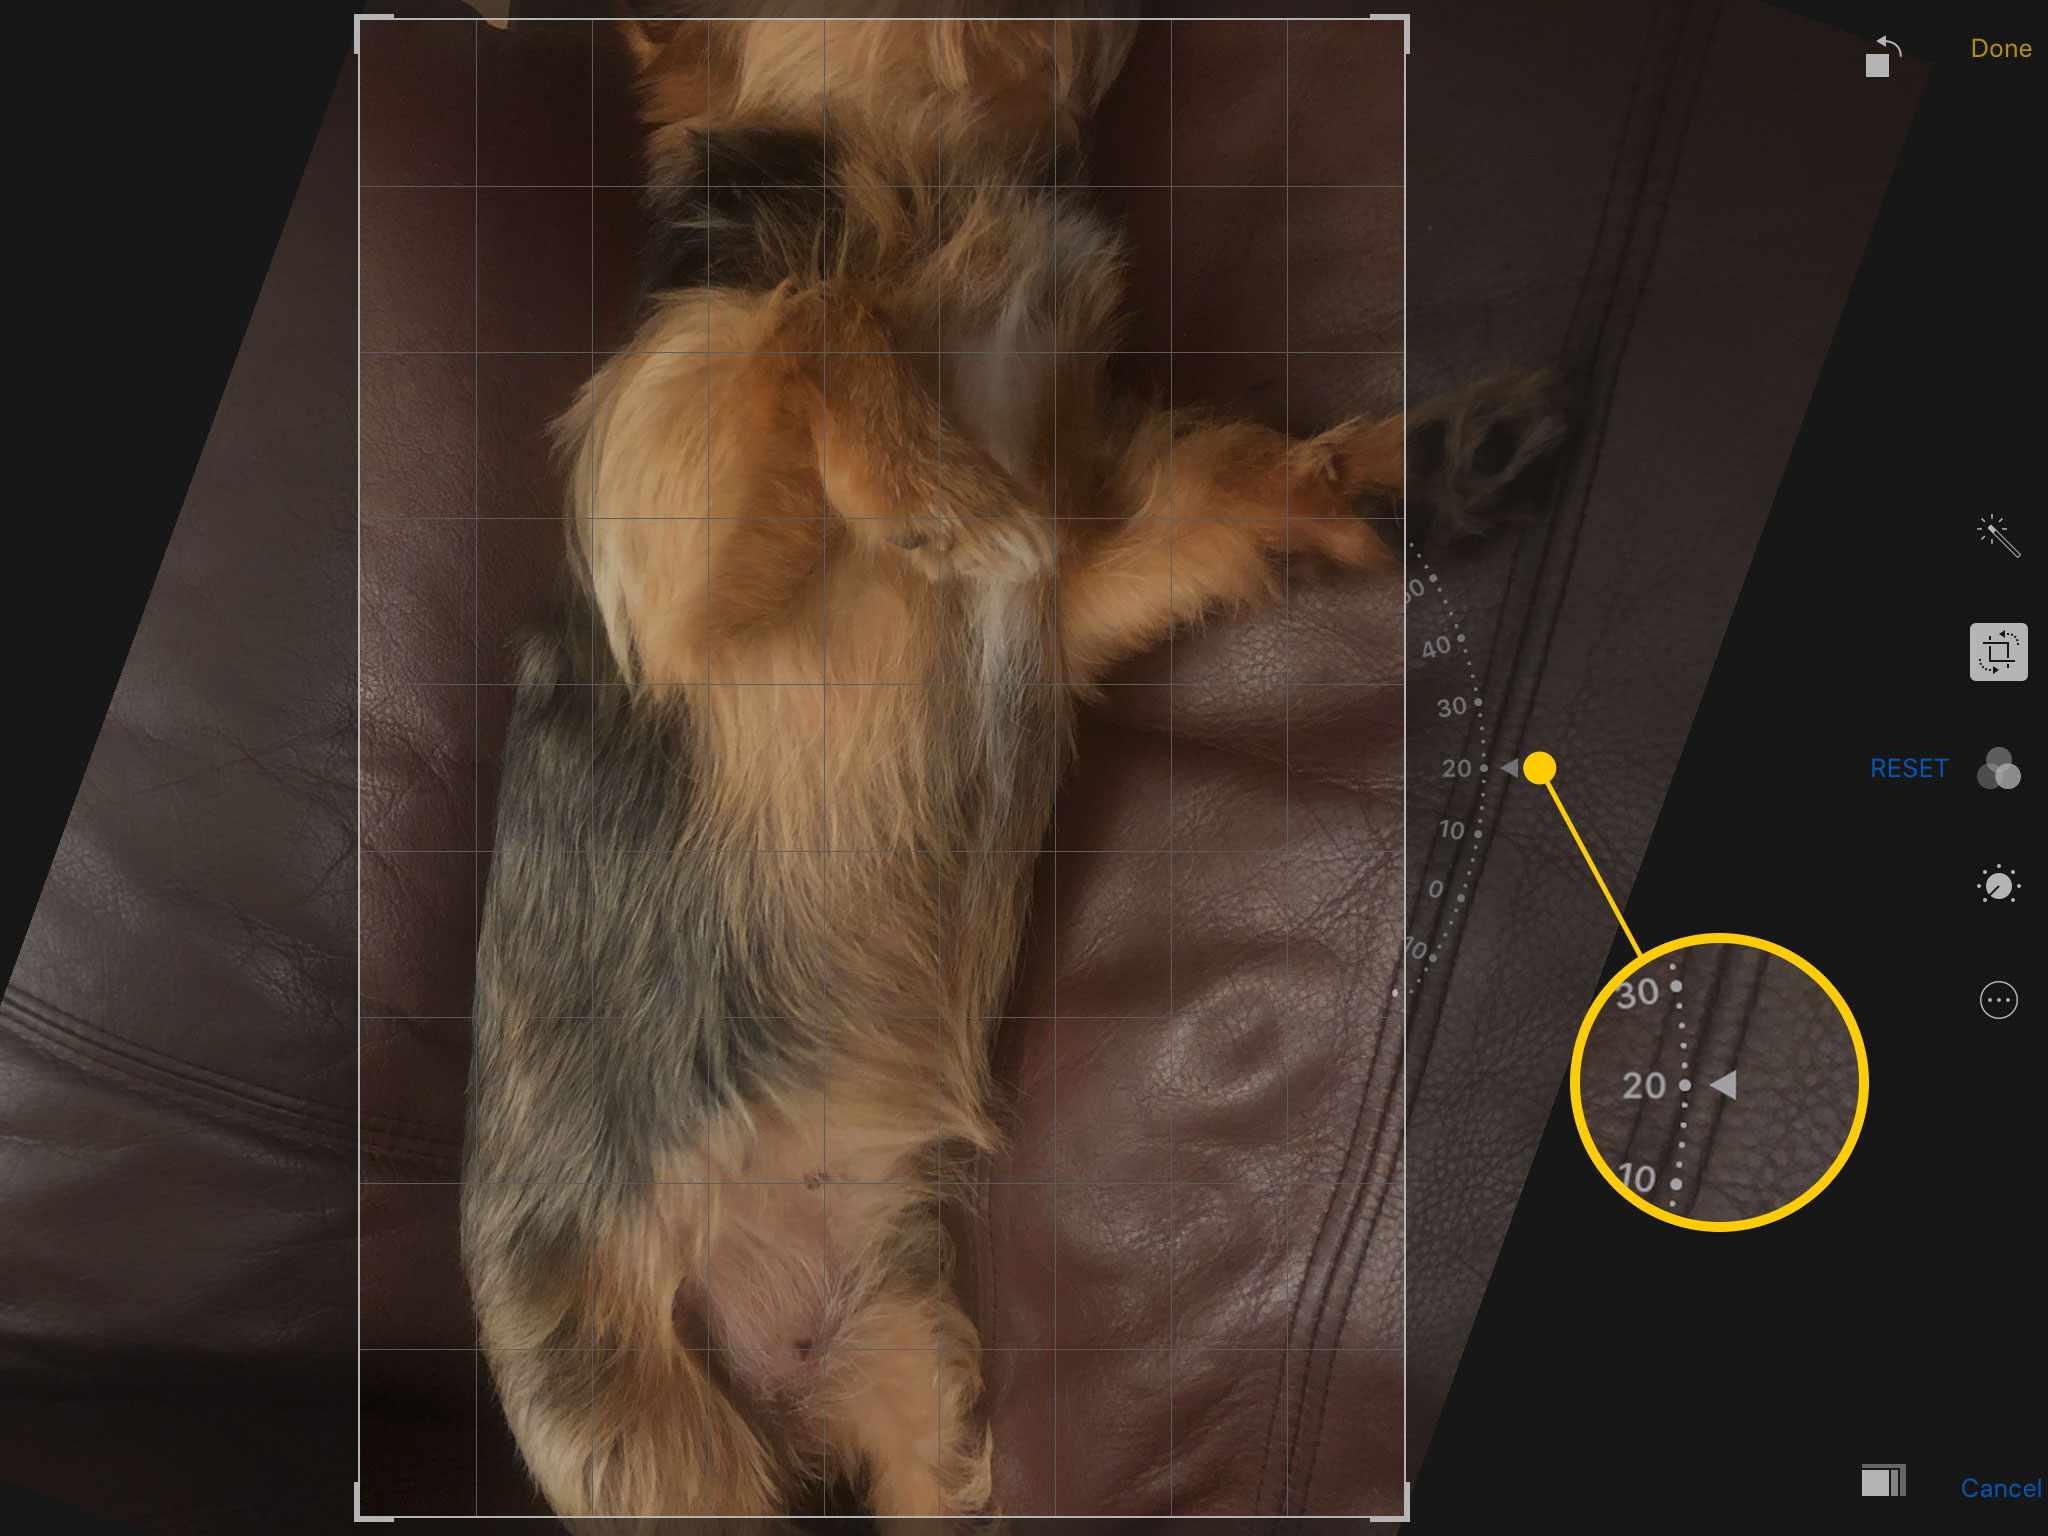 Free rotation tool in Photos on an iPad